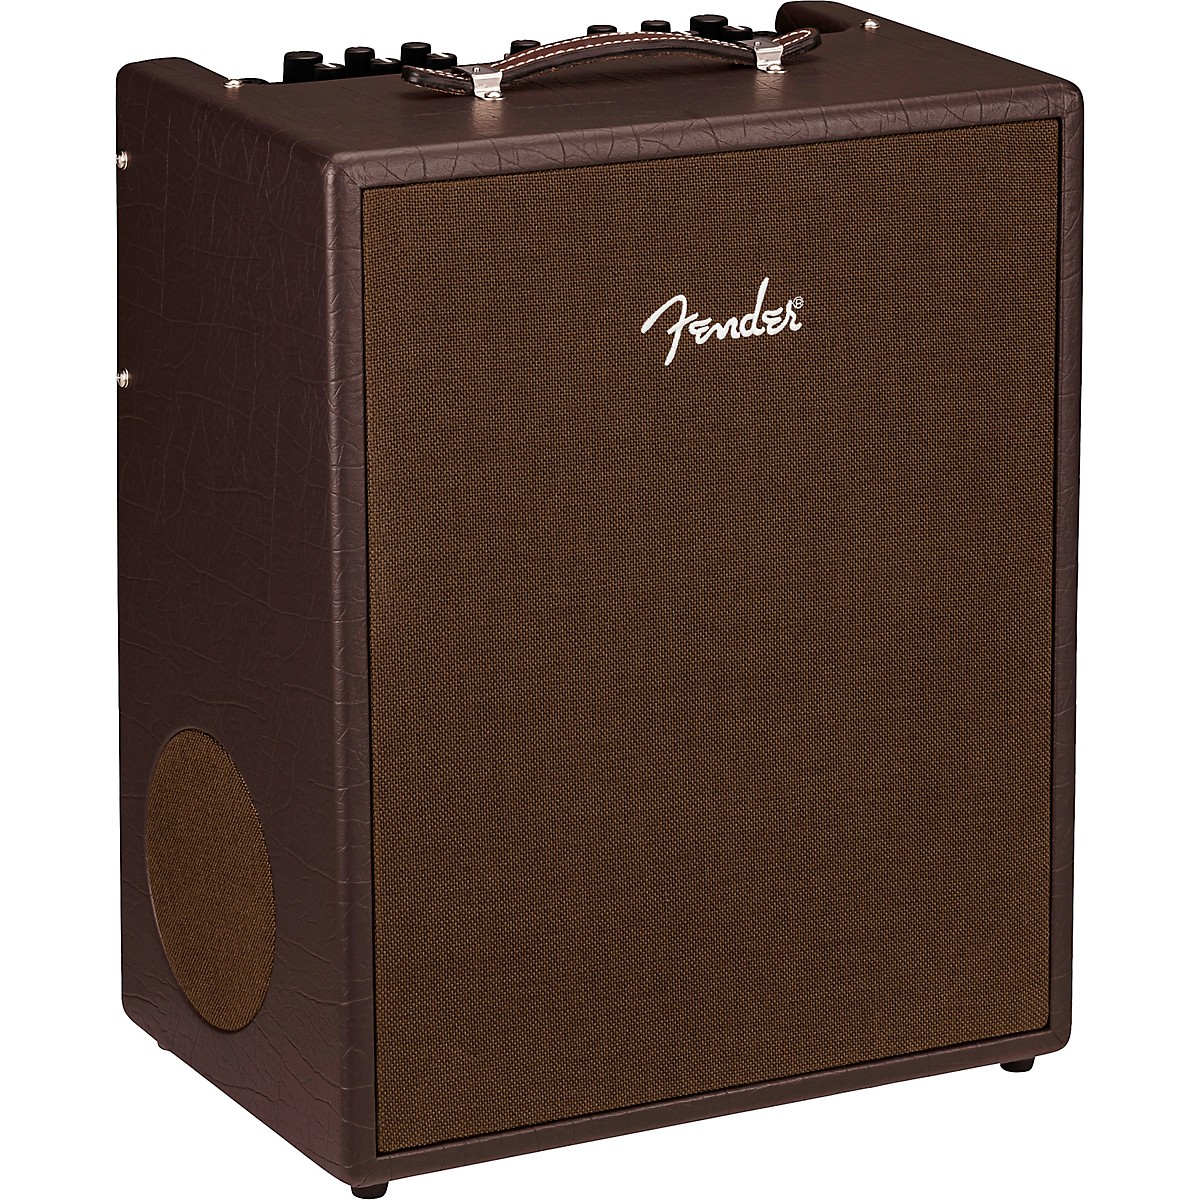 Fender Acoustic SFX II 100W Acoustic Guitar Combo Amplifier